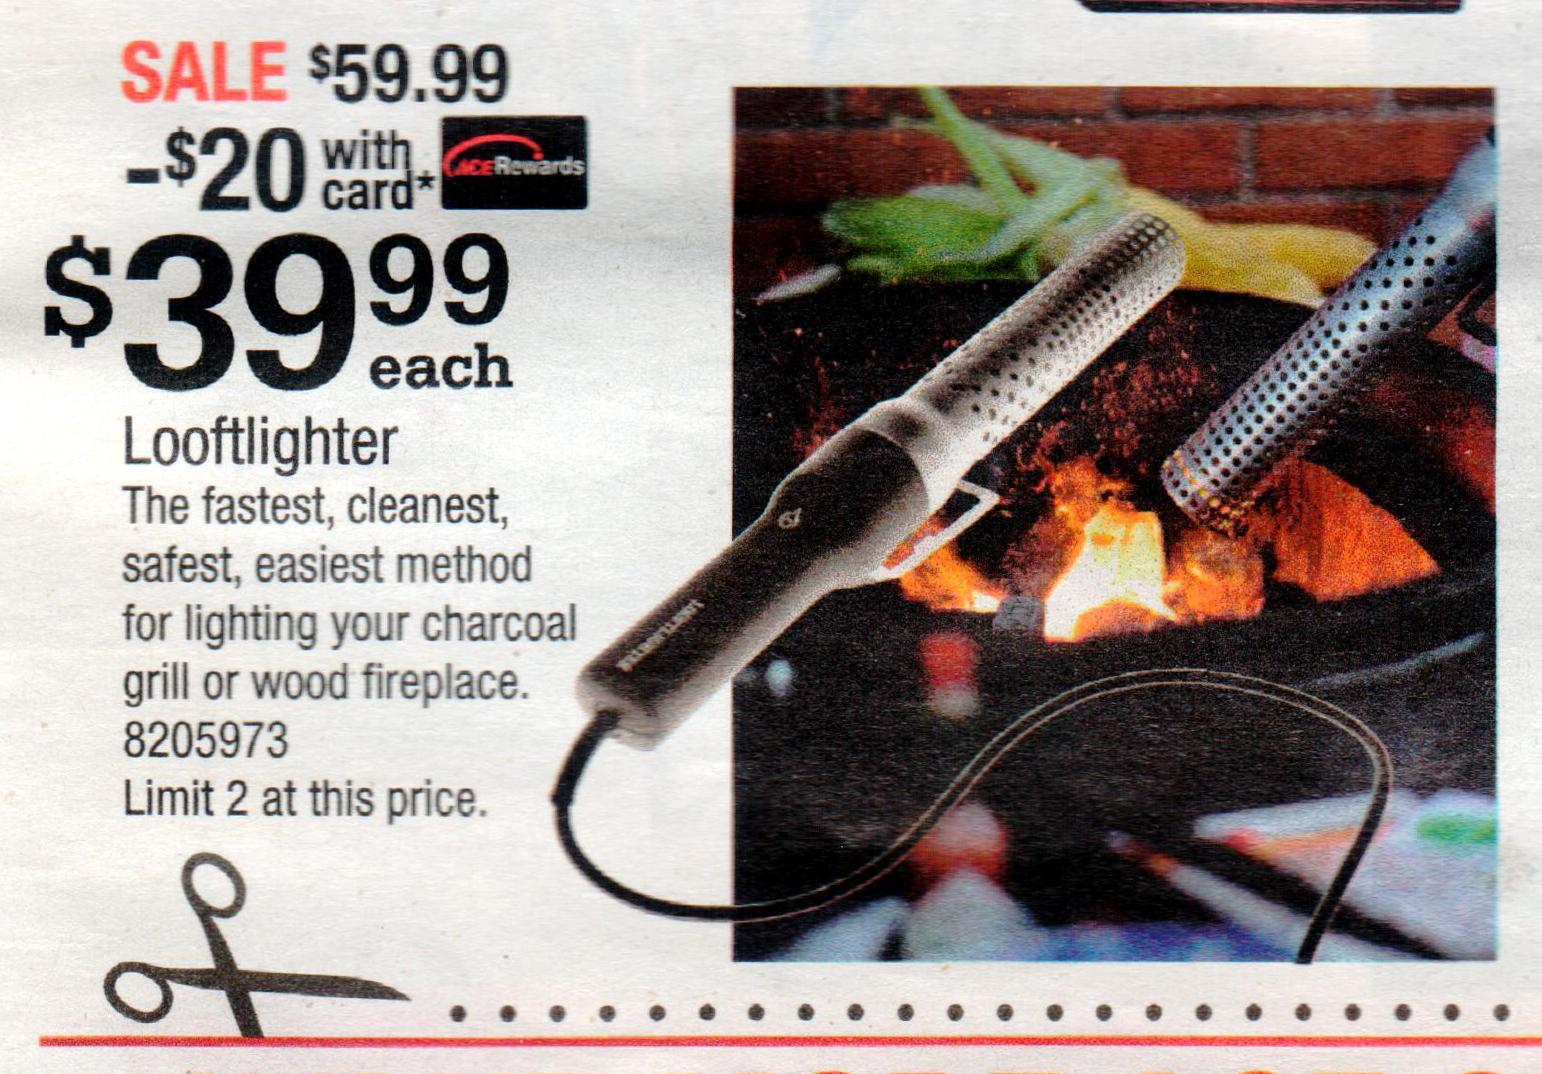 Looftlighter @ Ace hardware $39.99